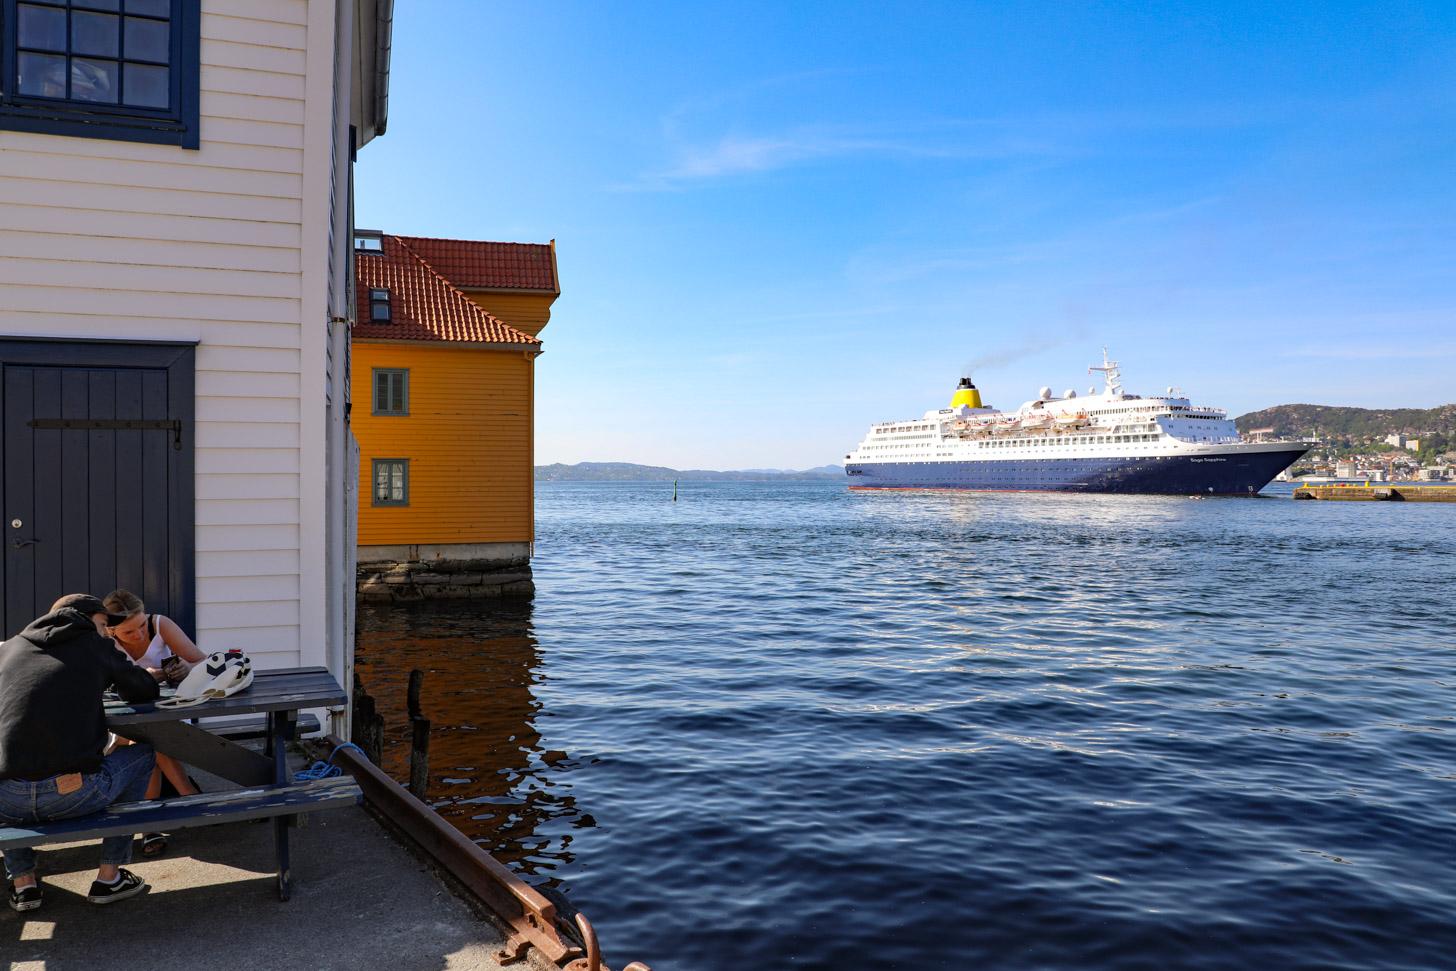 Cruisebestemming Bergen